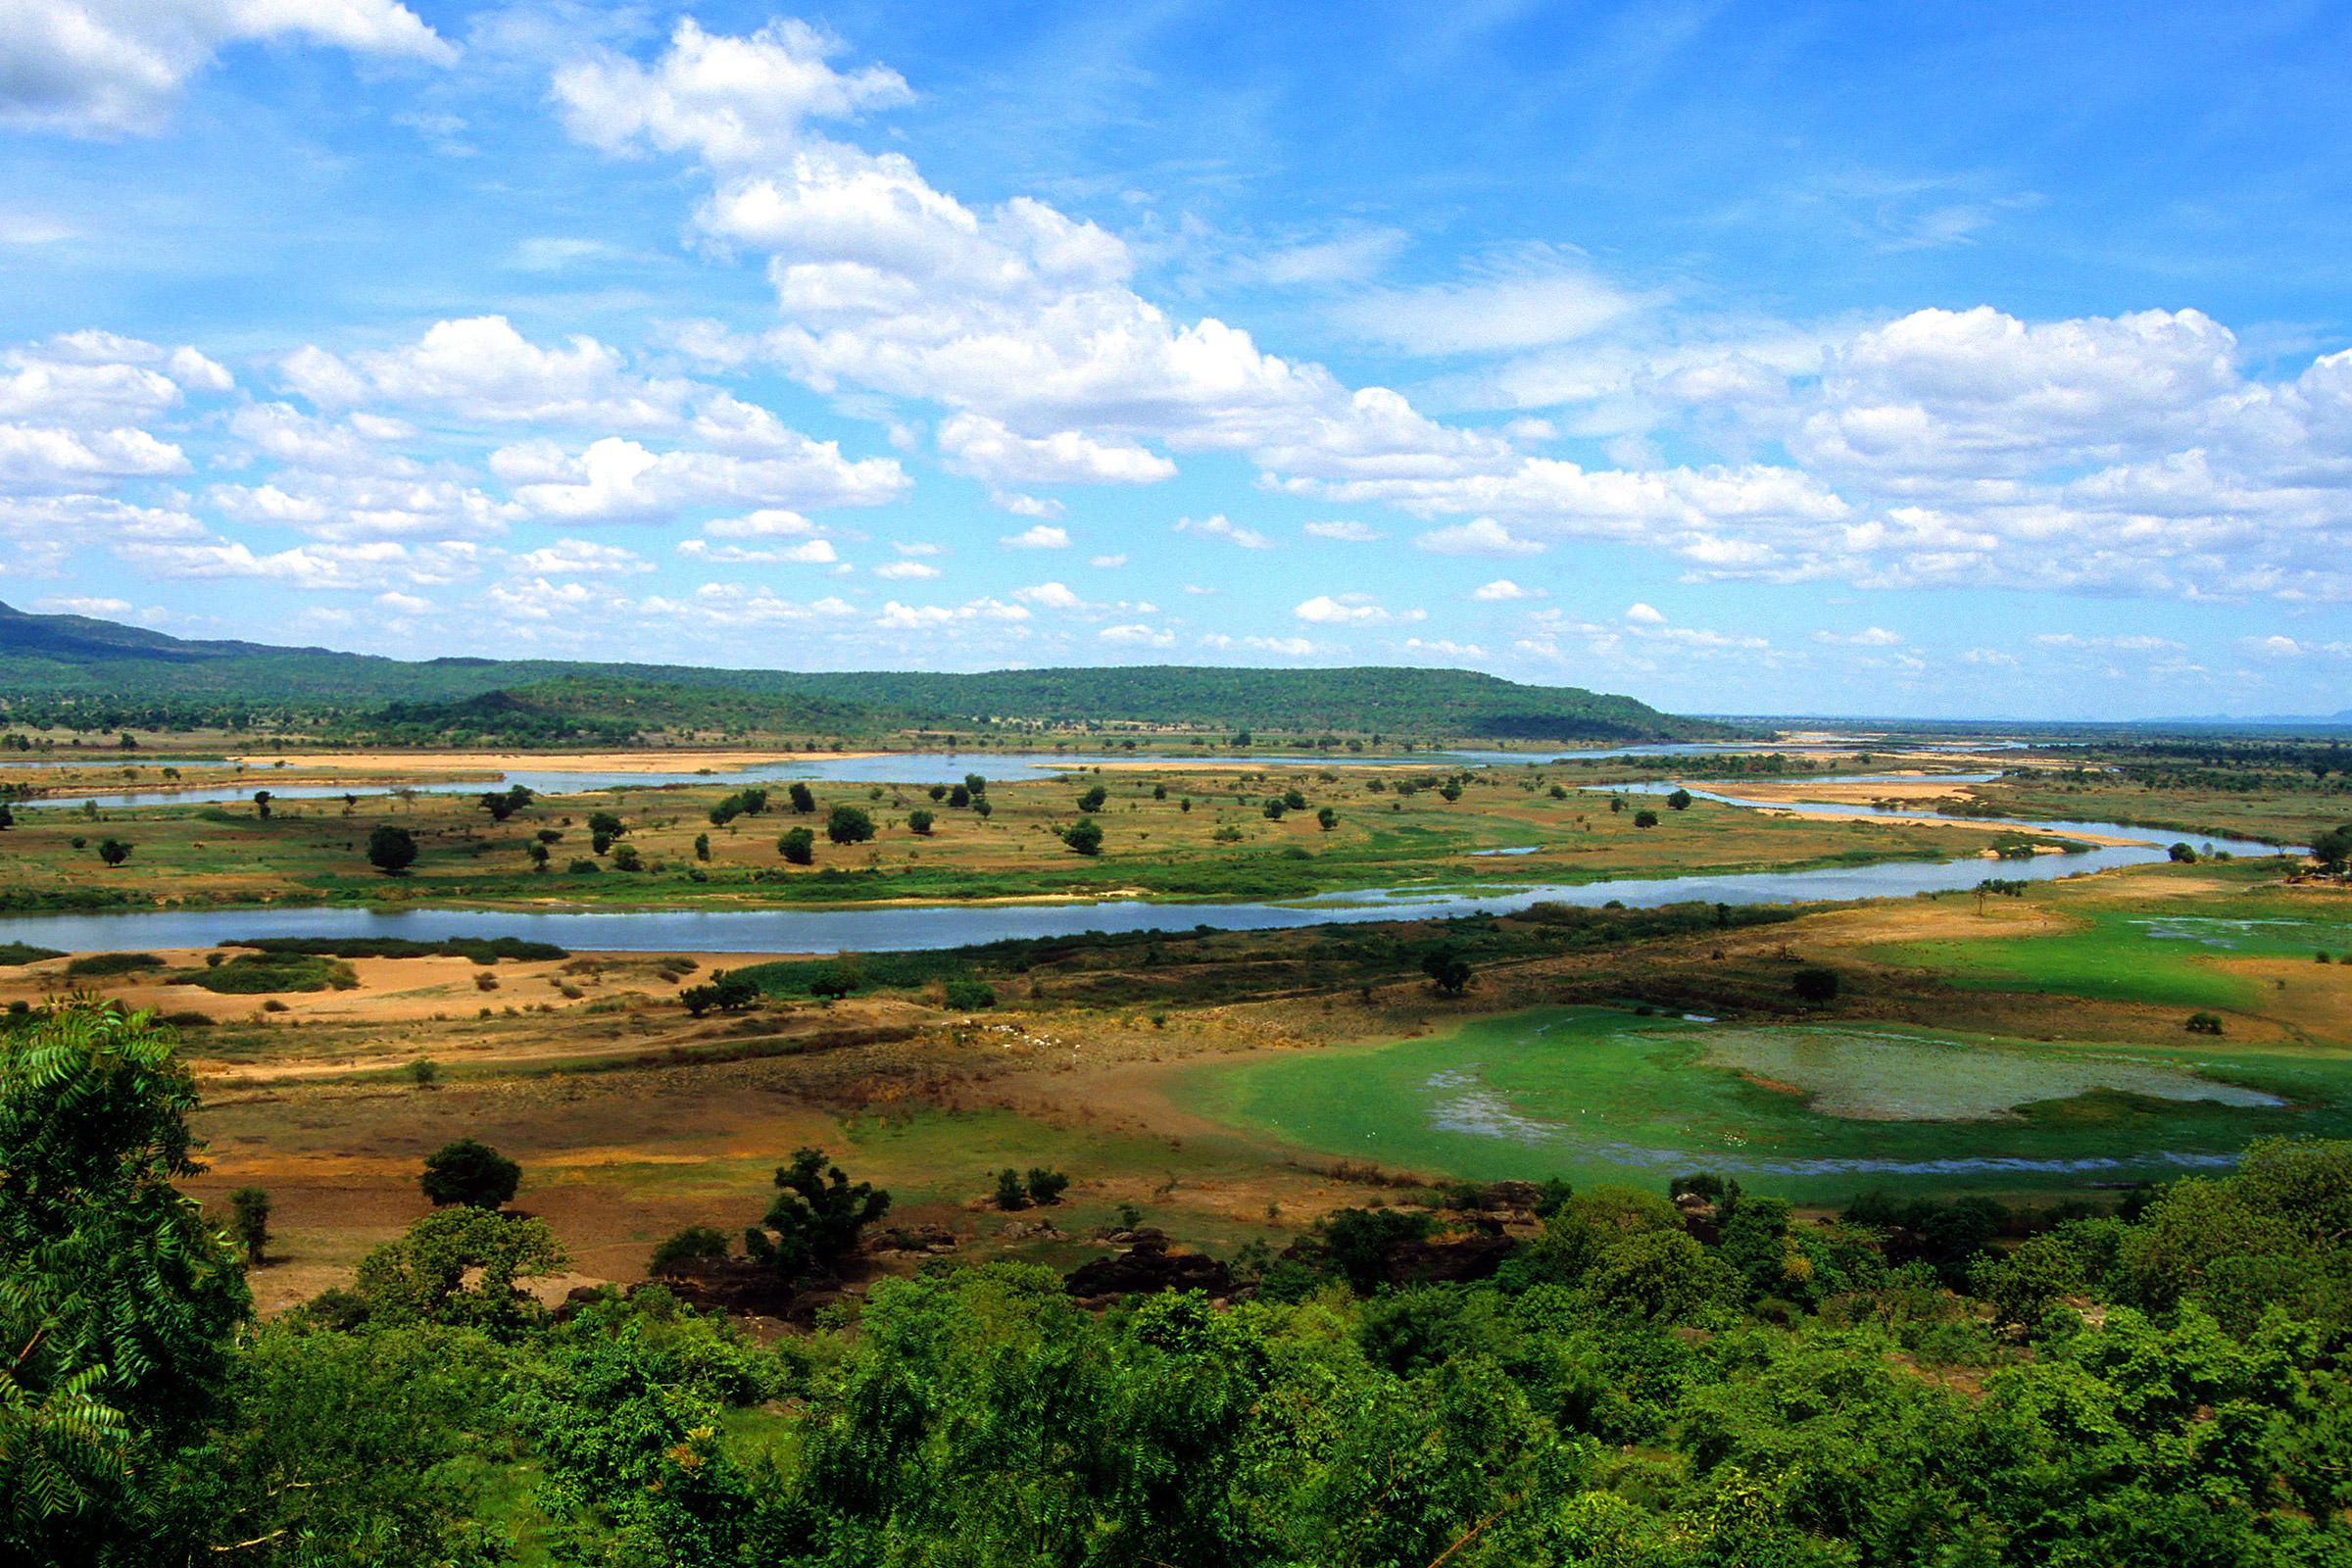 Nigeria Benue River